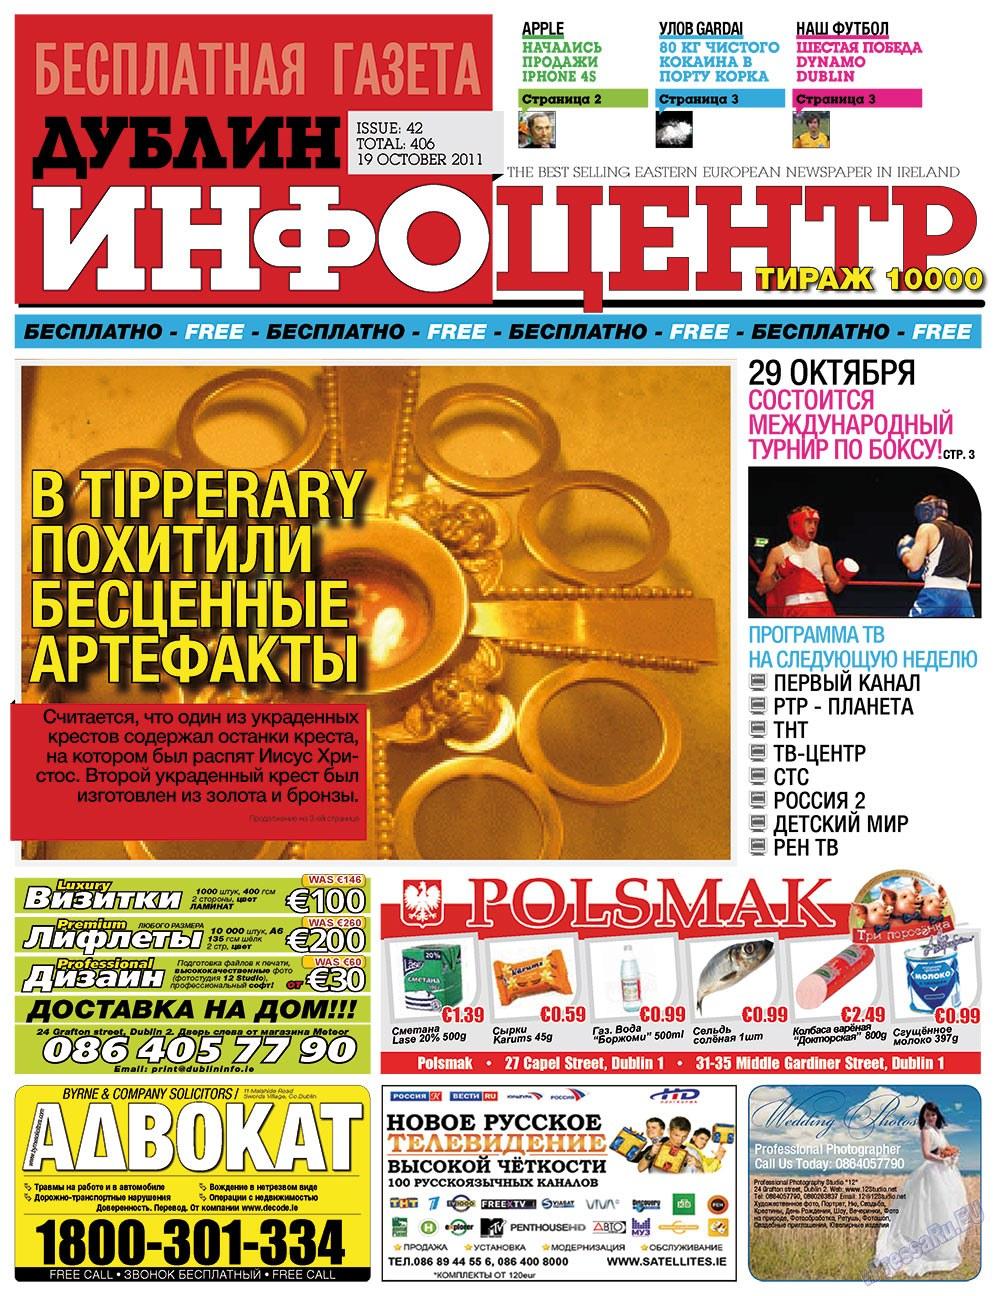 Дублин инфоцентр (газета). 2011 год, номер 42, стр. 1